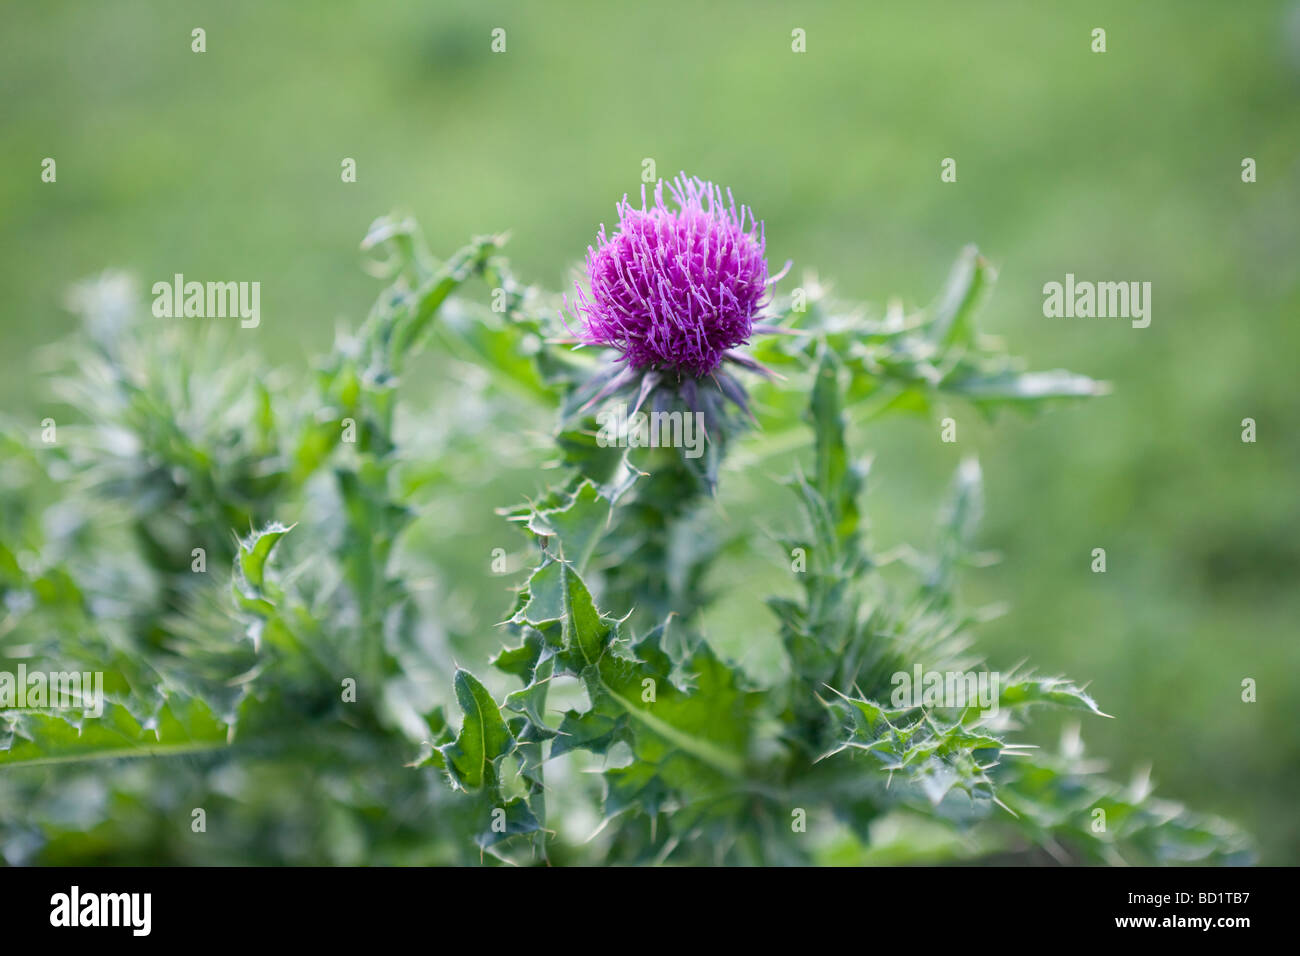 Scotch thistle Onopordum acanthium - Stock Image